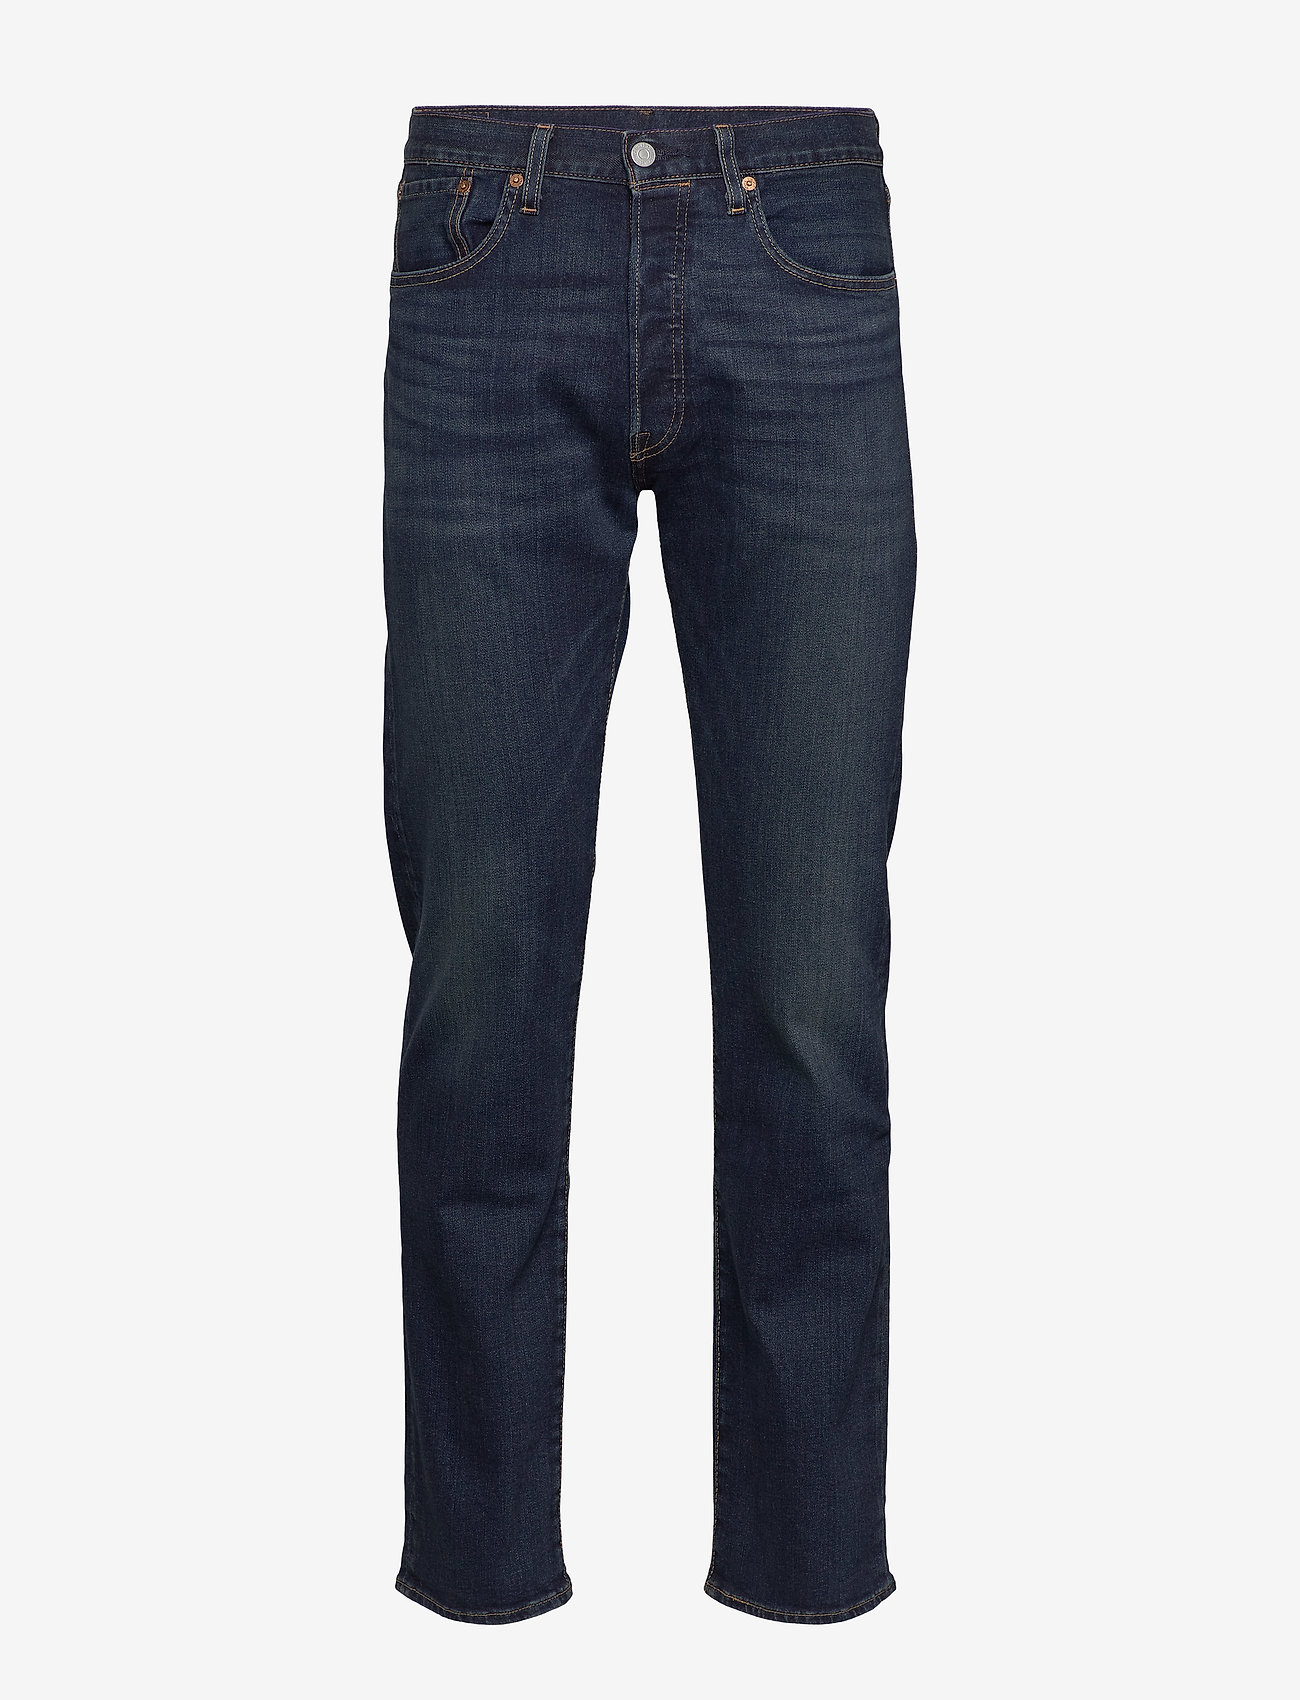 LEVI´S Men - 501 LEVISORIGINAL BLOCK CRUSHE - regular jeans - dark indigo - worn in - 0